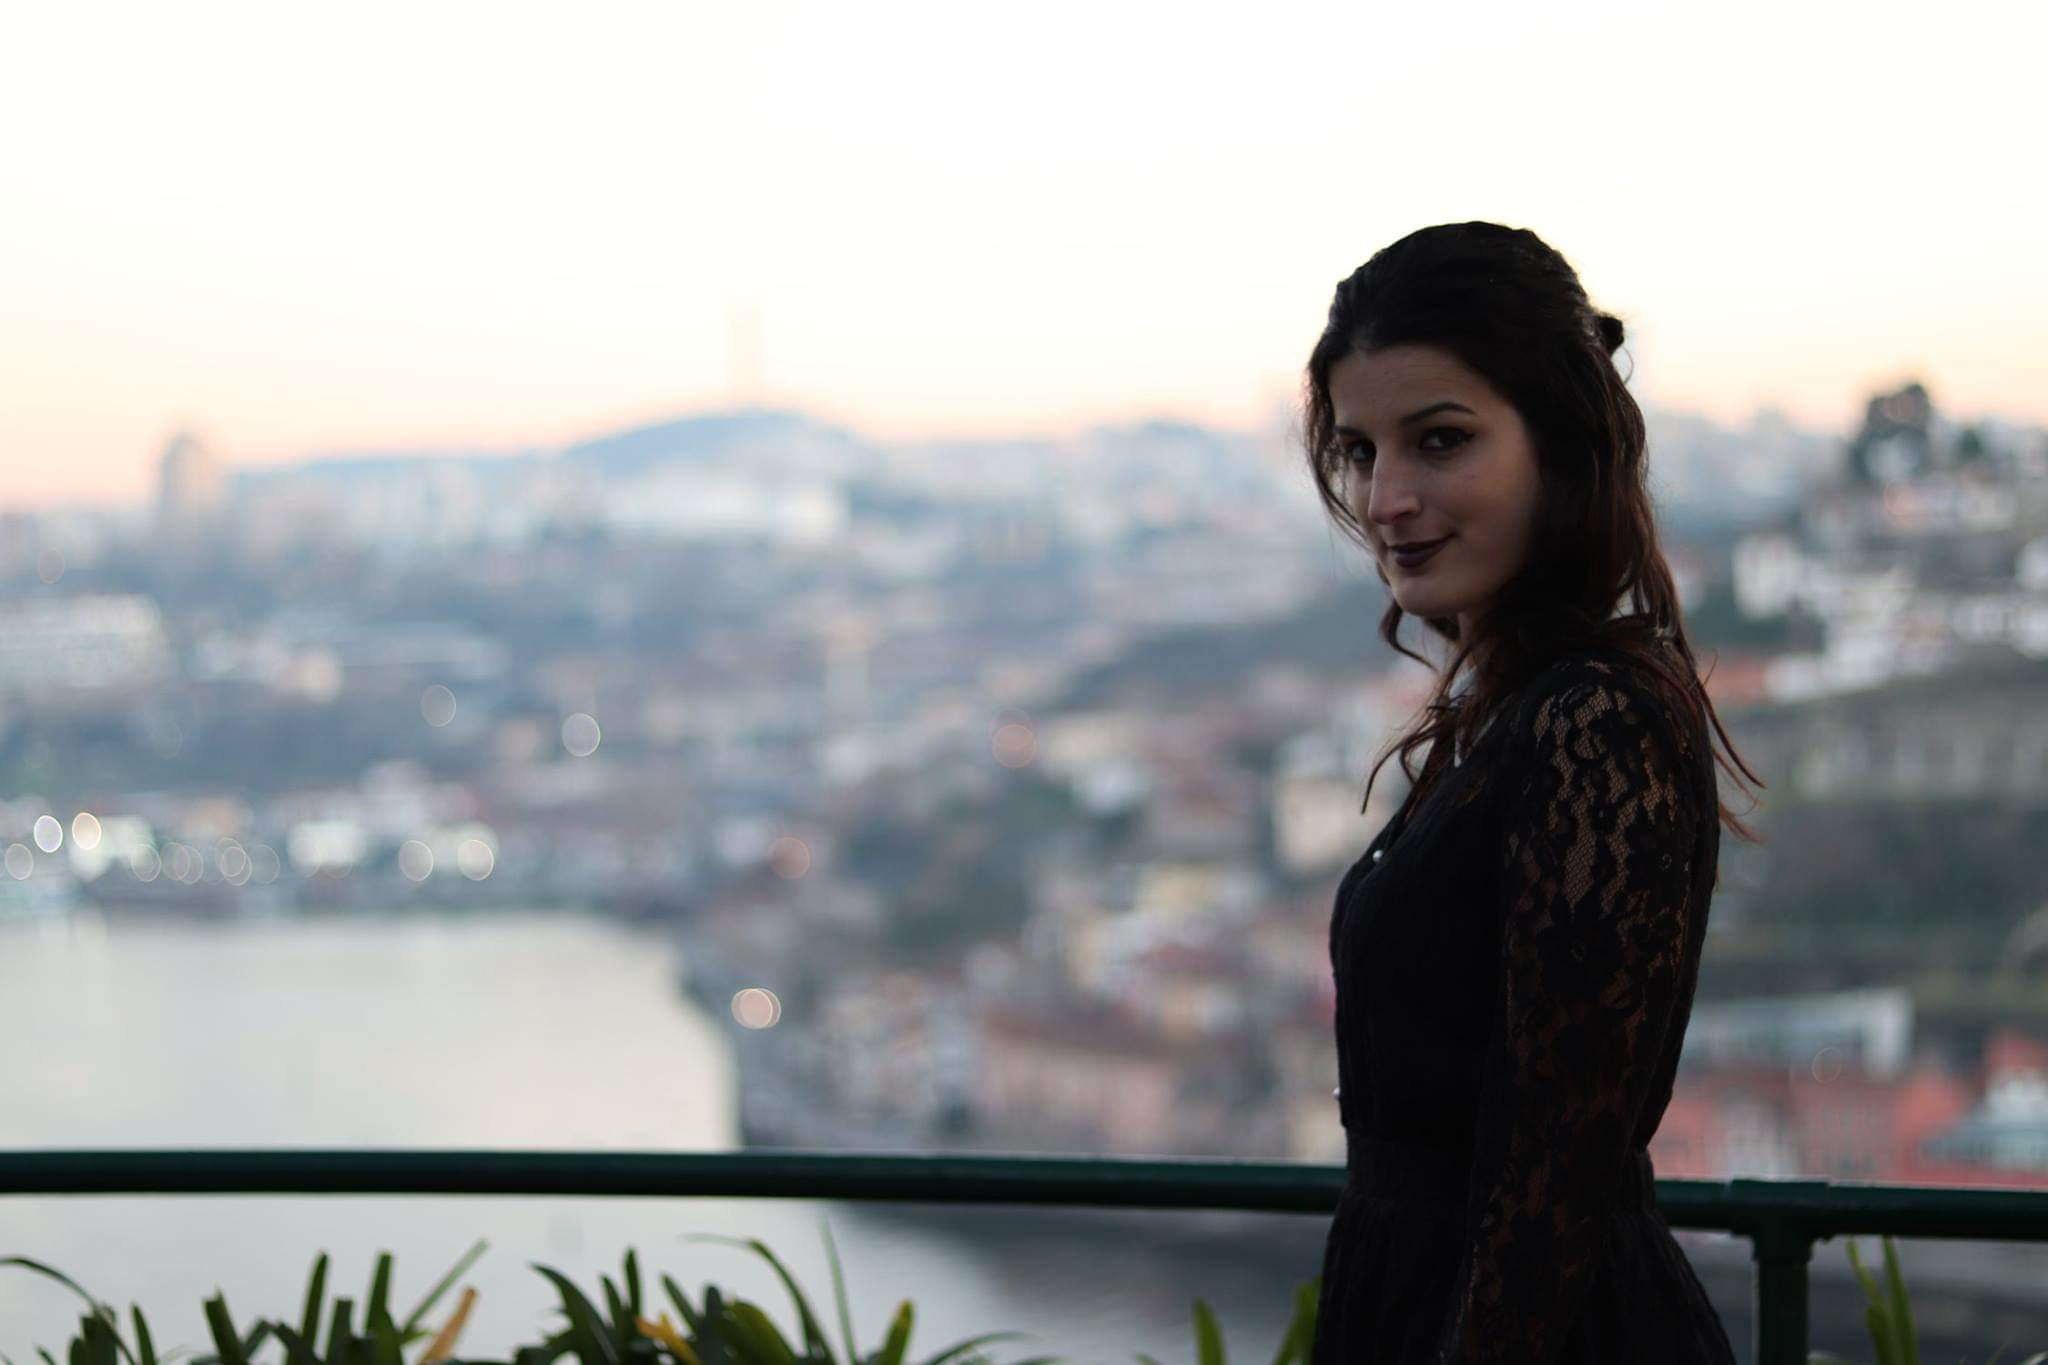 Filipa Santos Sousa